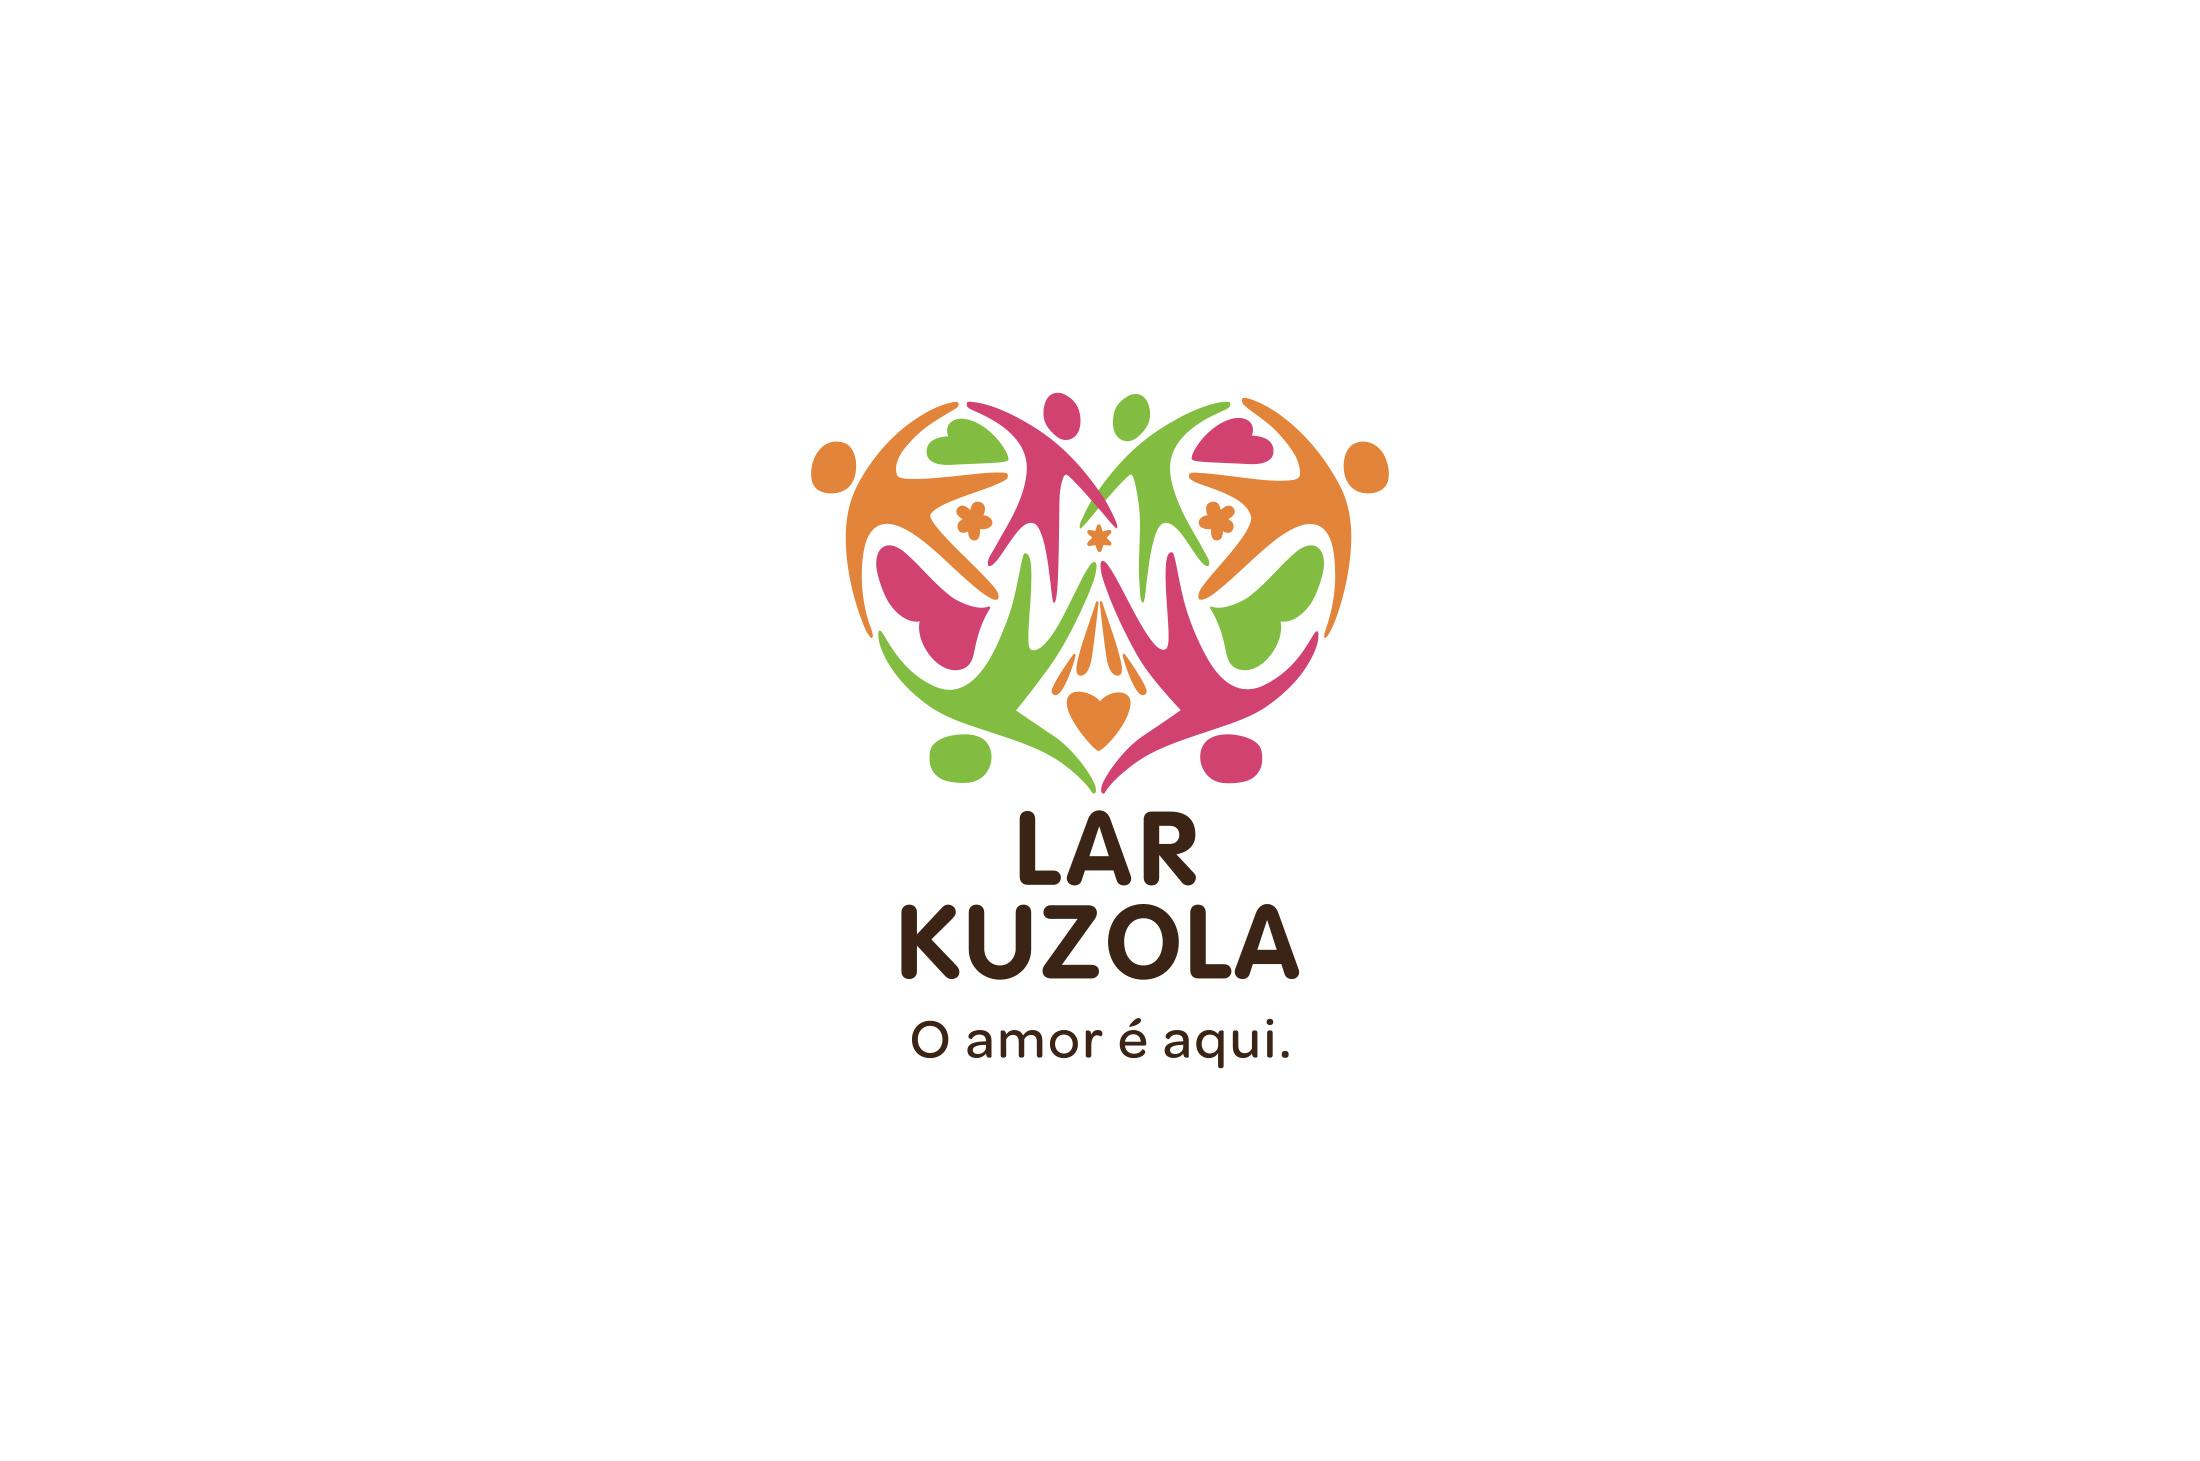 larkuzola_lg